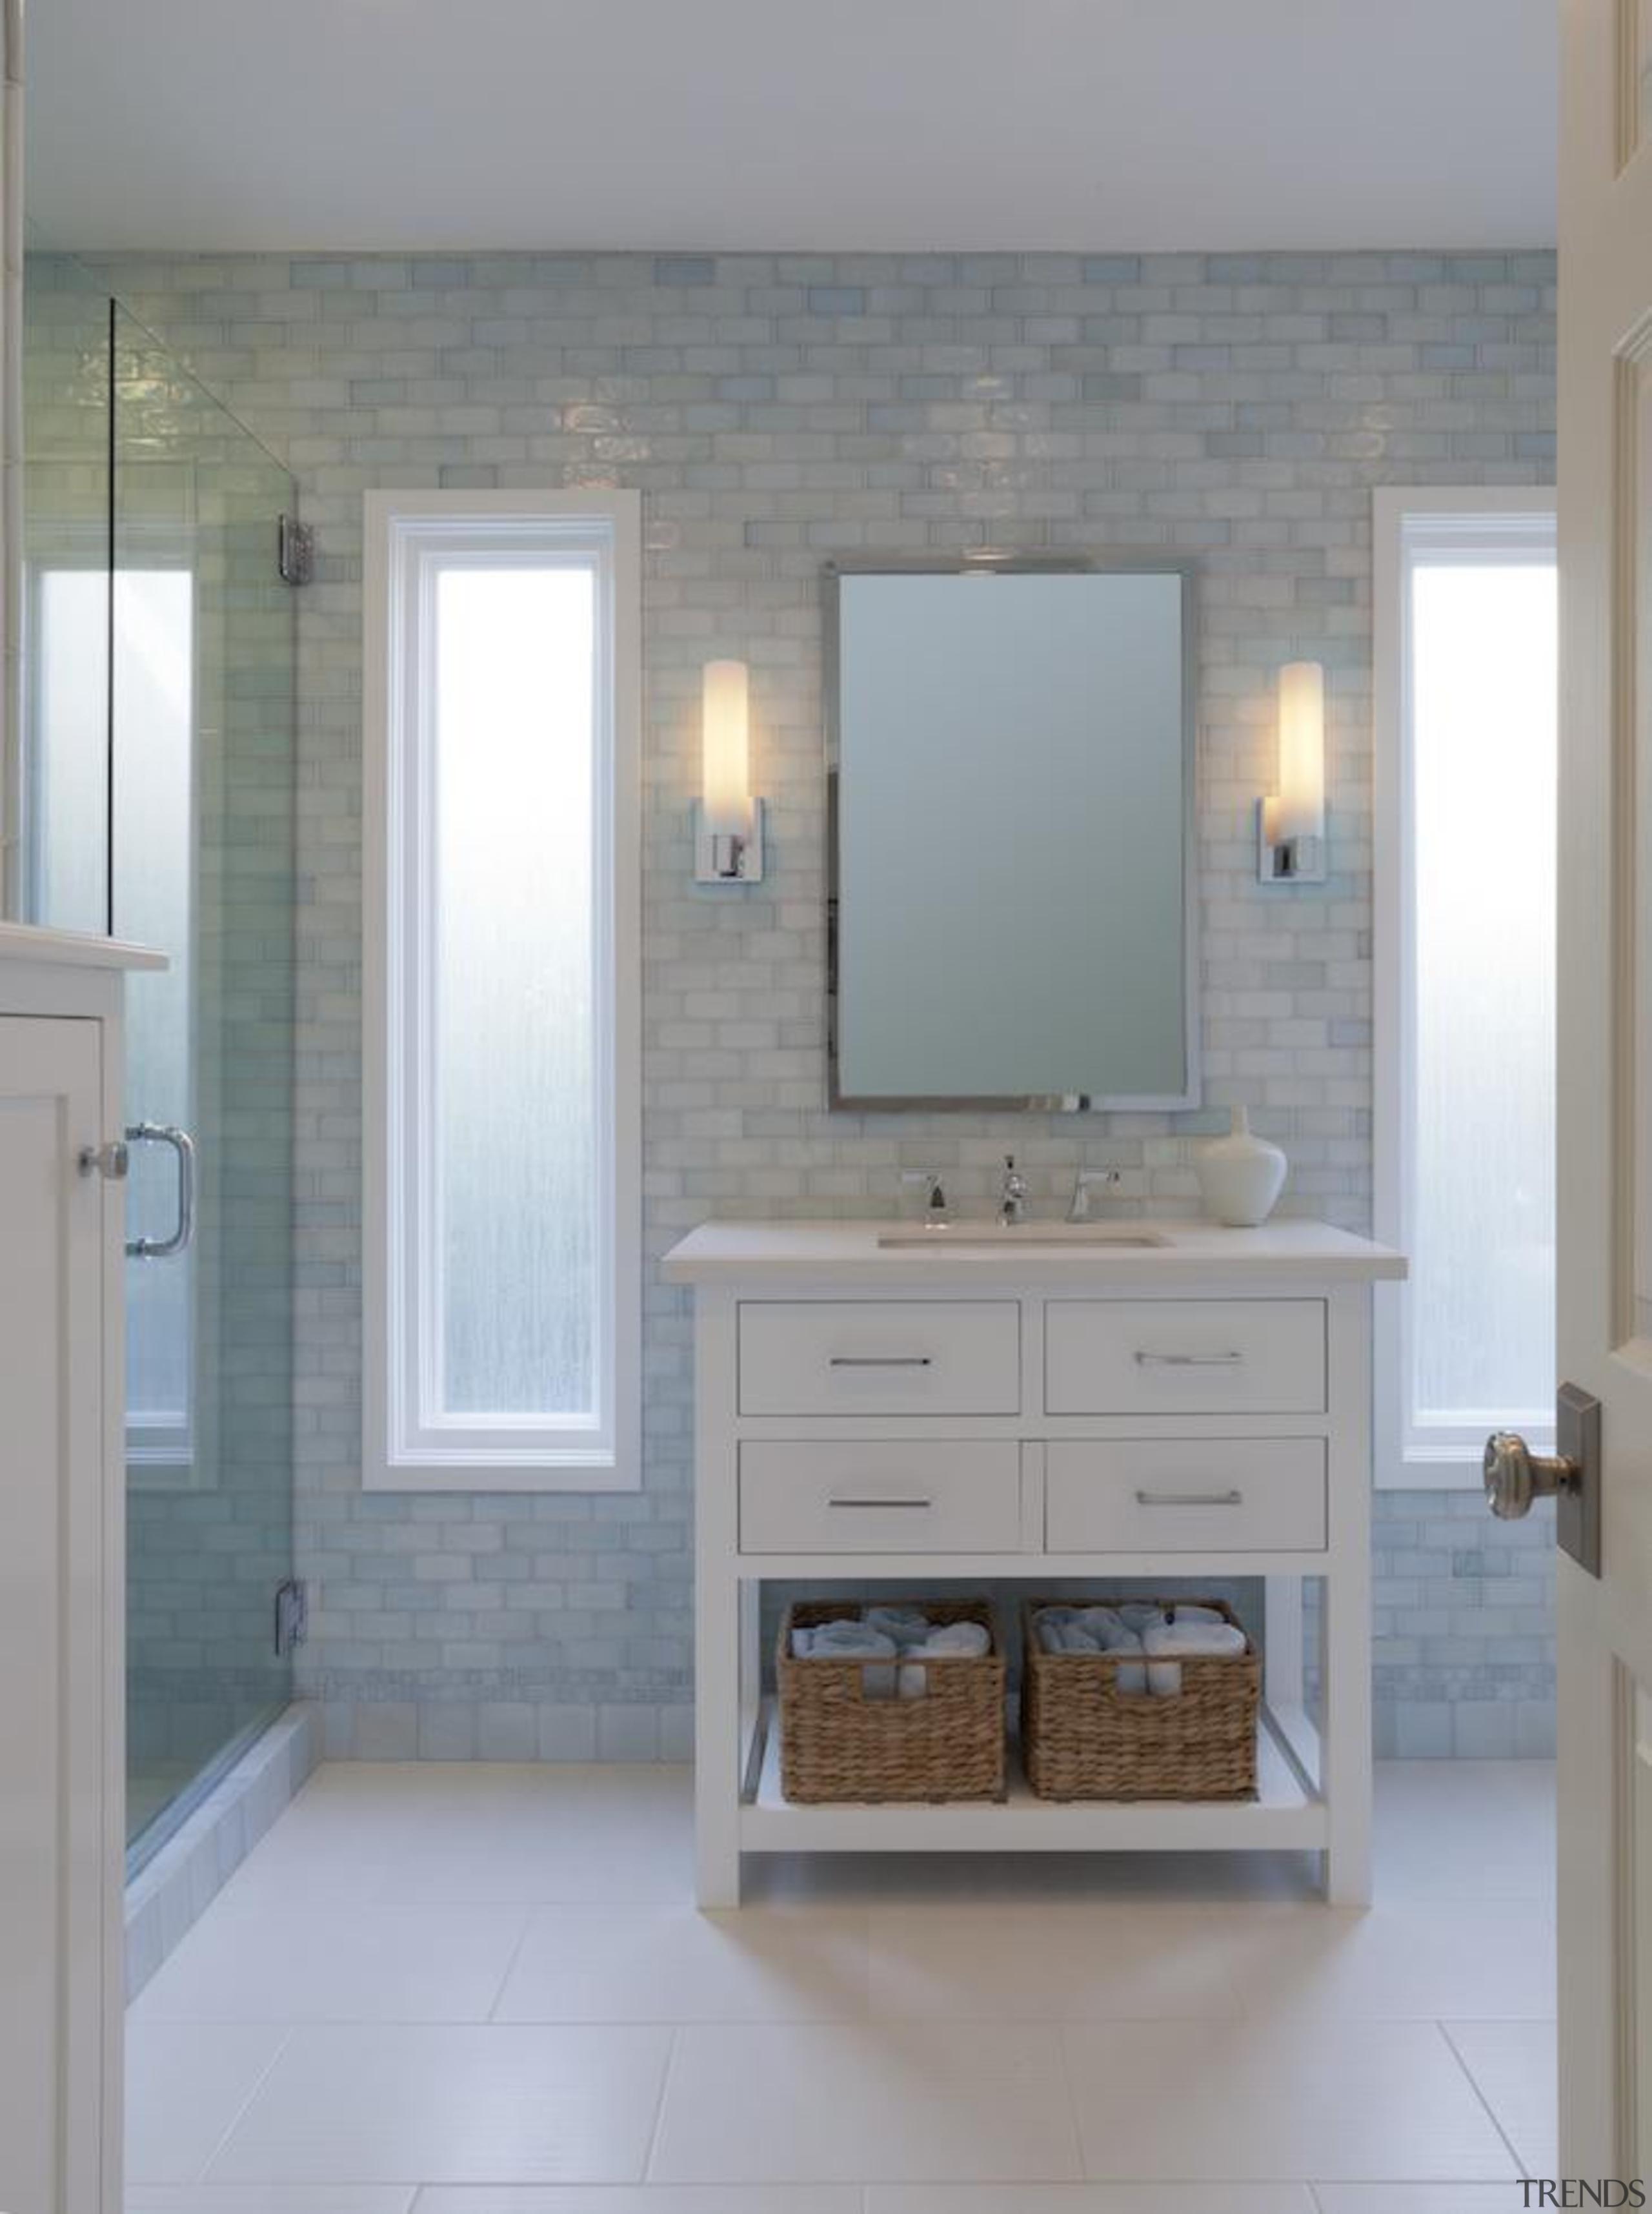 This bathroom evokes a spa like serene feel. bathroom, bathroom accessory, bathroom cabinet, cabinetry, floor, flooring, hardwood, home, interior design, room, sink, tile, wall, wood flooring, wood stain, gray